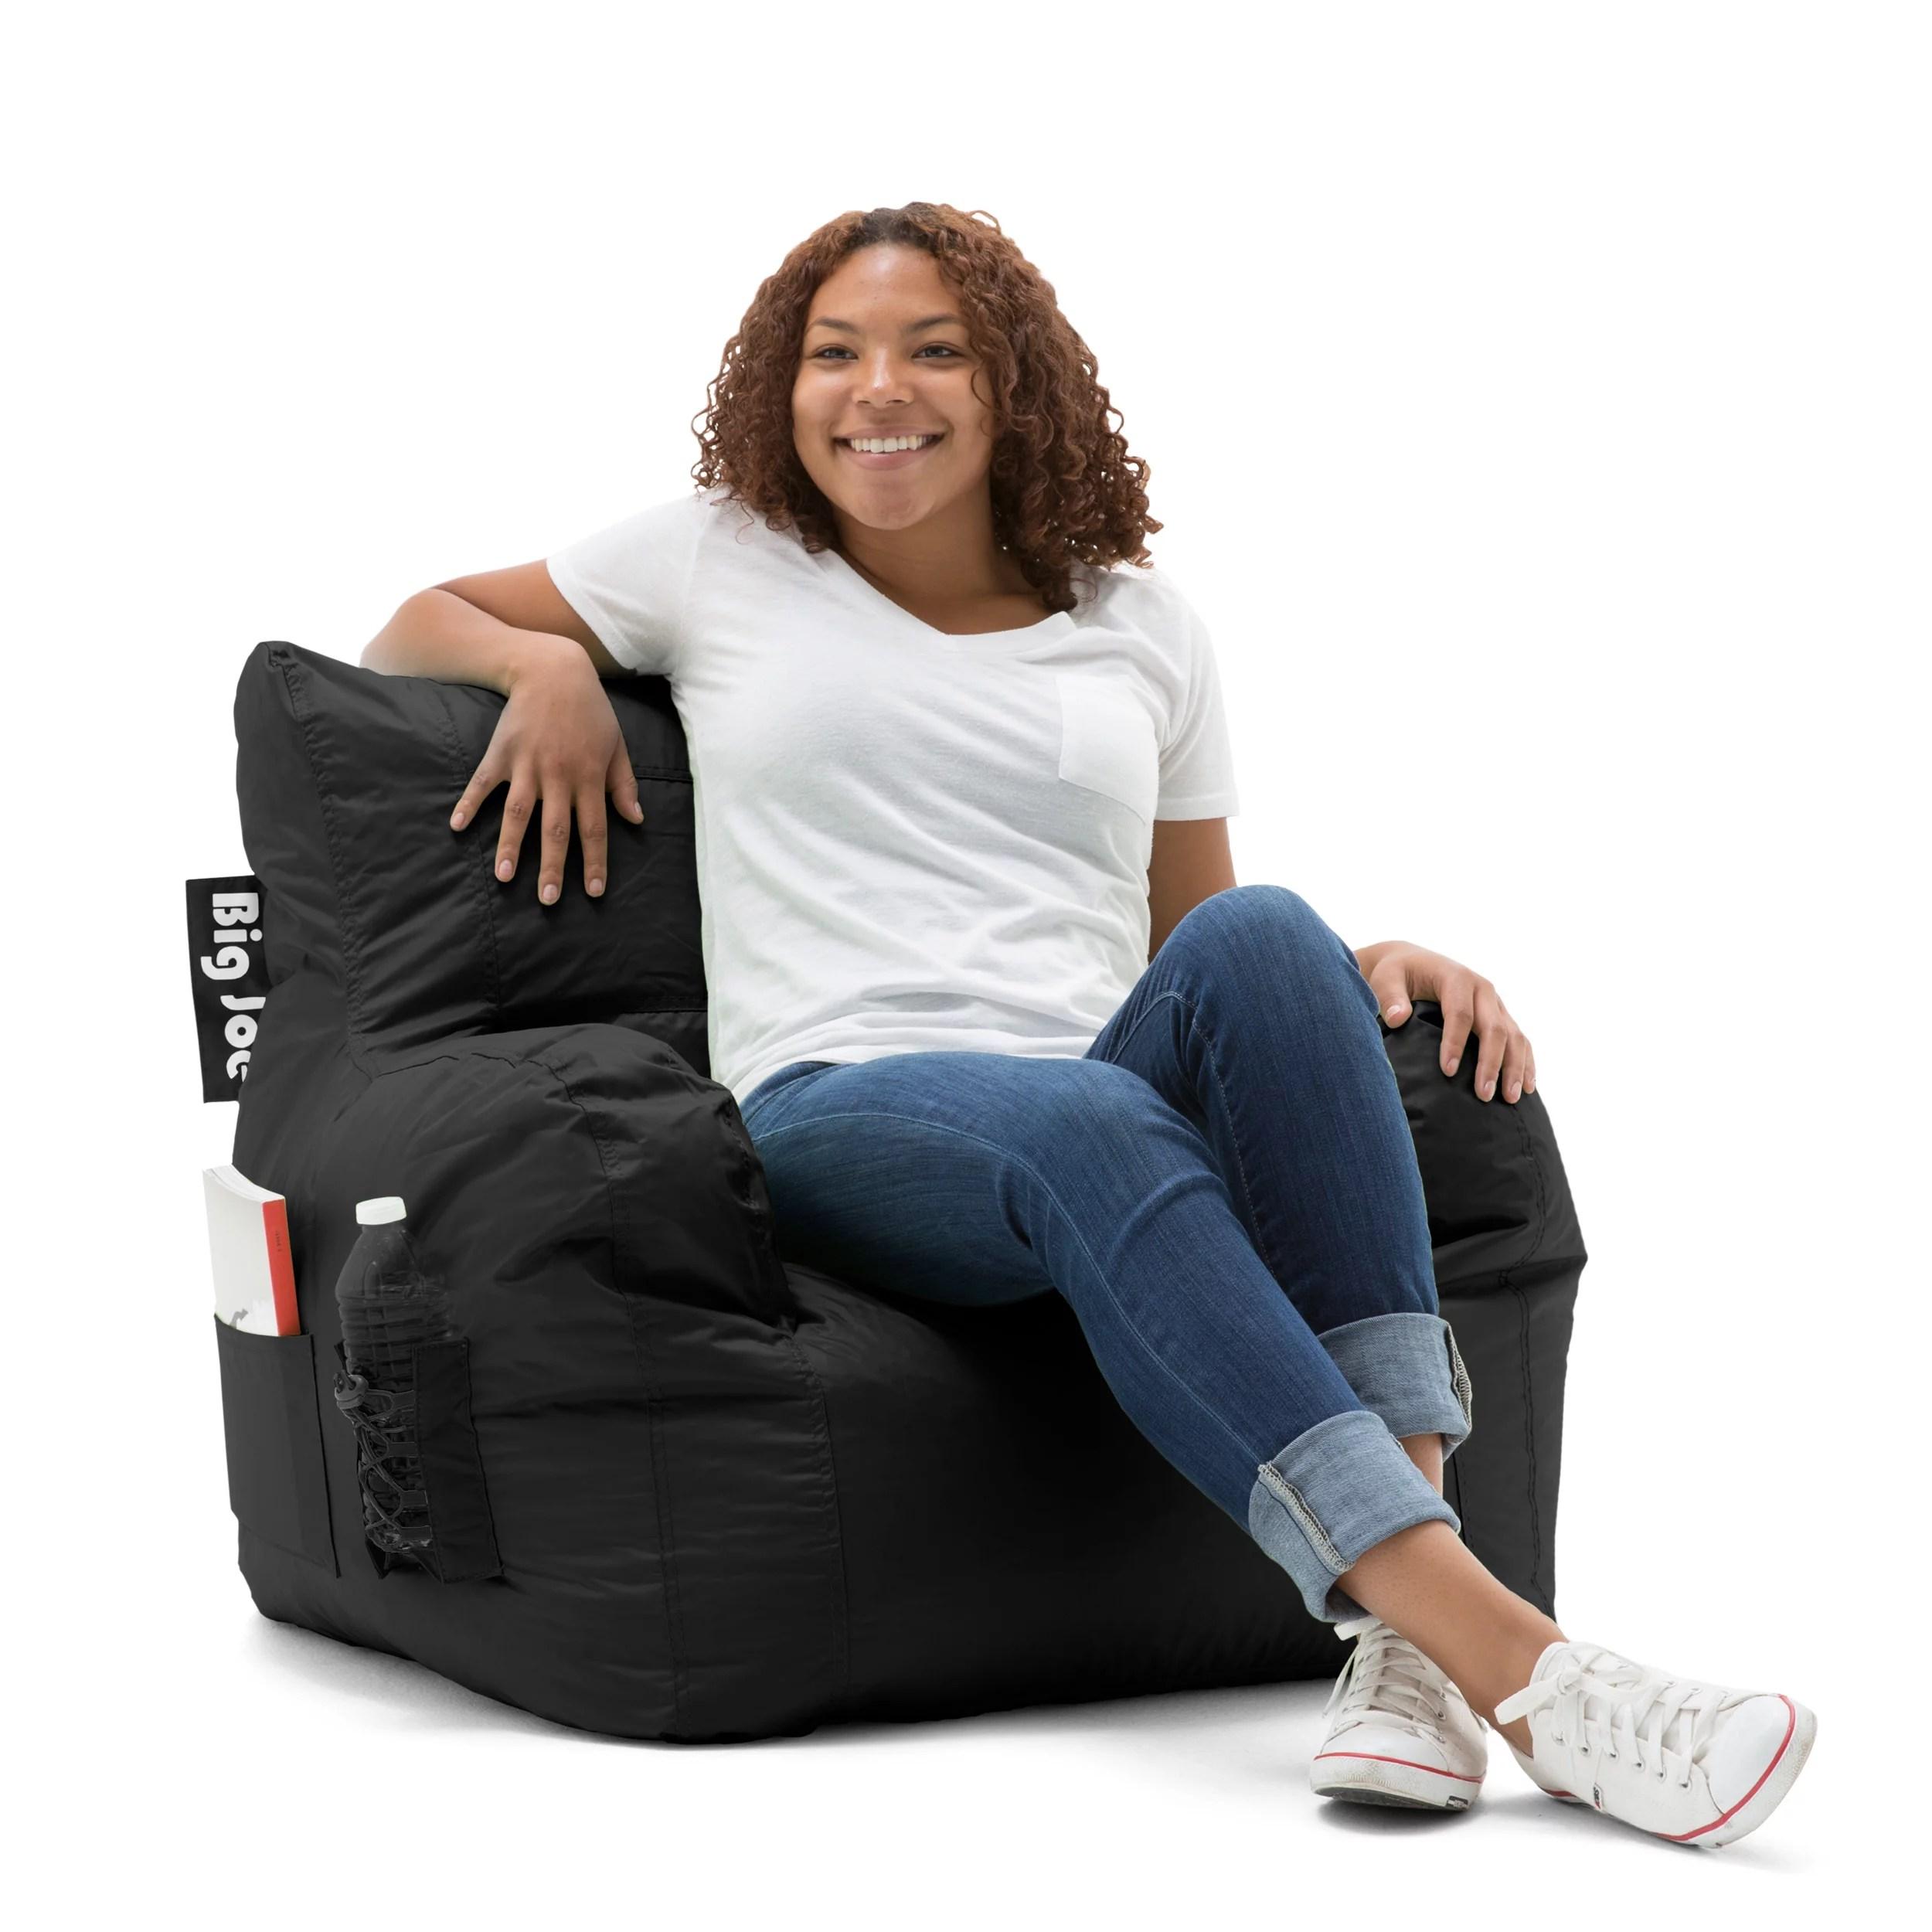 bean bag chairs cheap baby bing chair walmart com product image big joe multiple colors 33 x 32